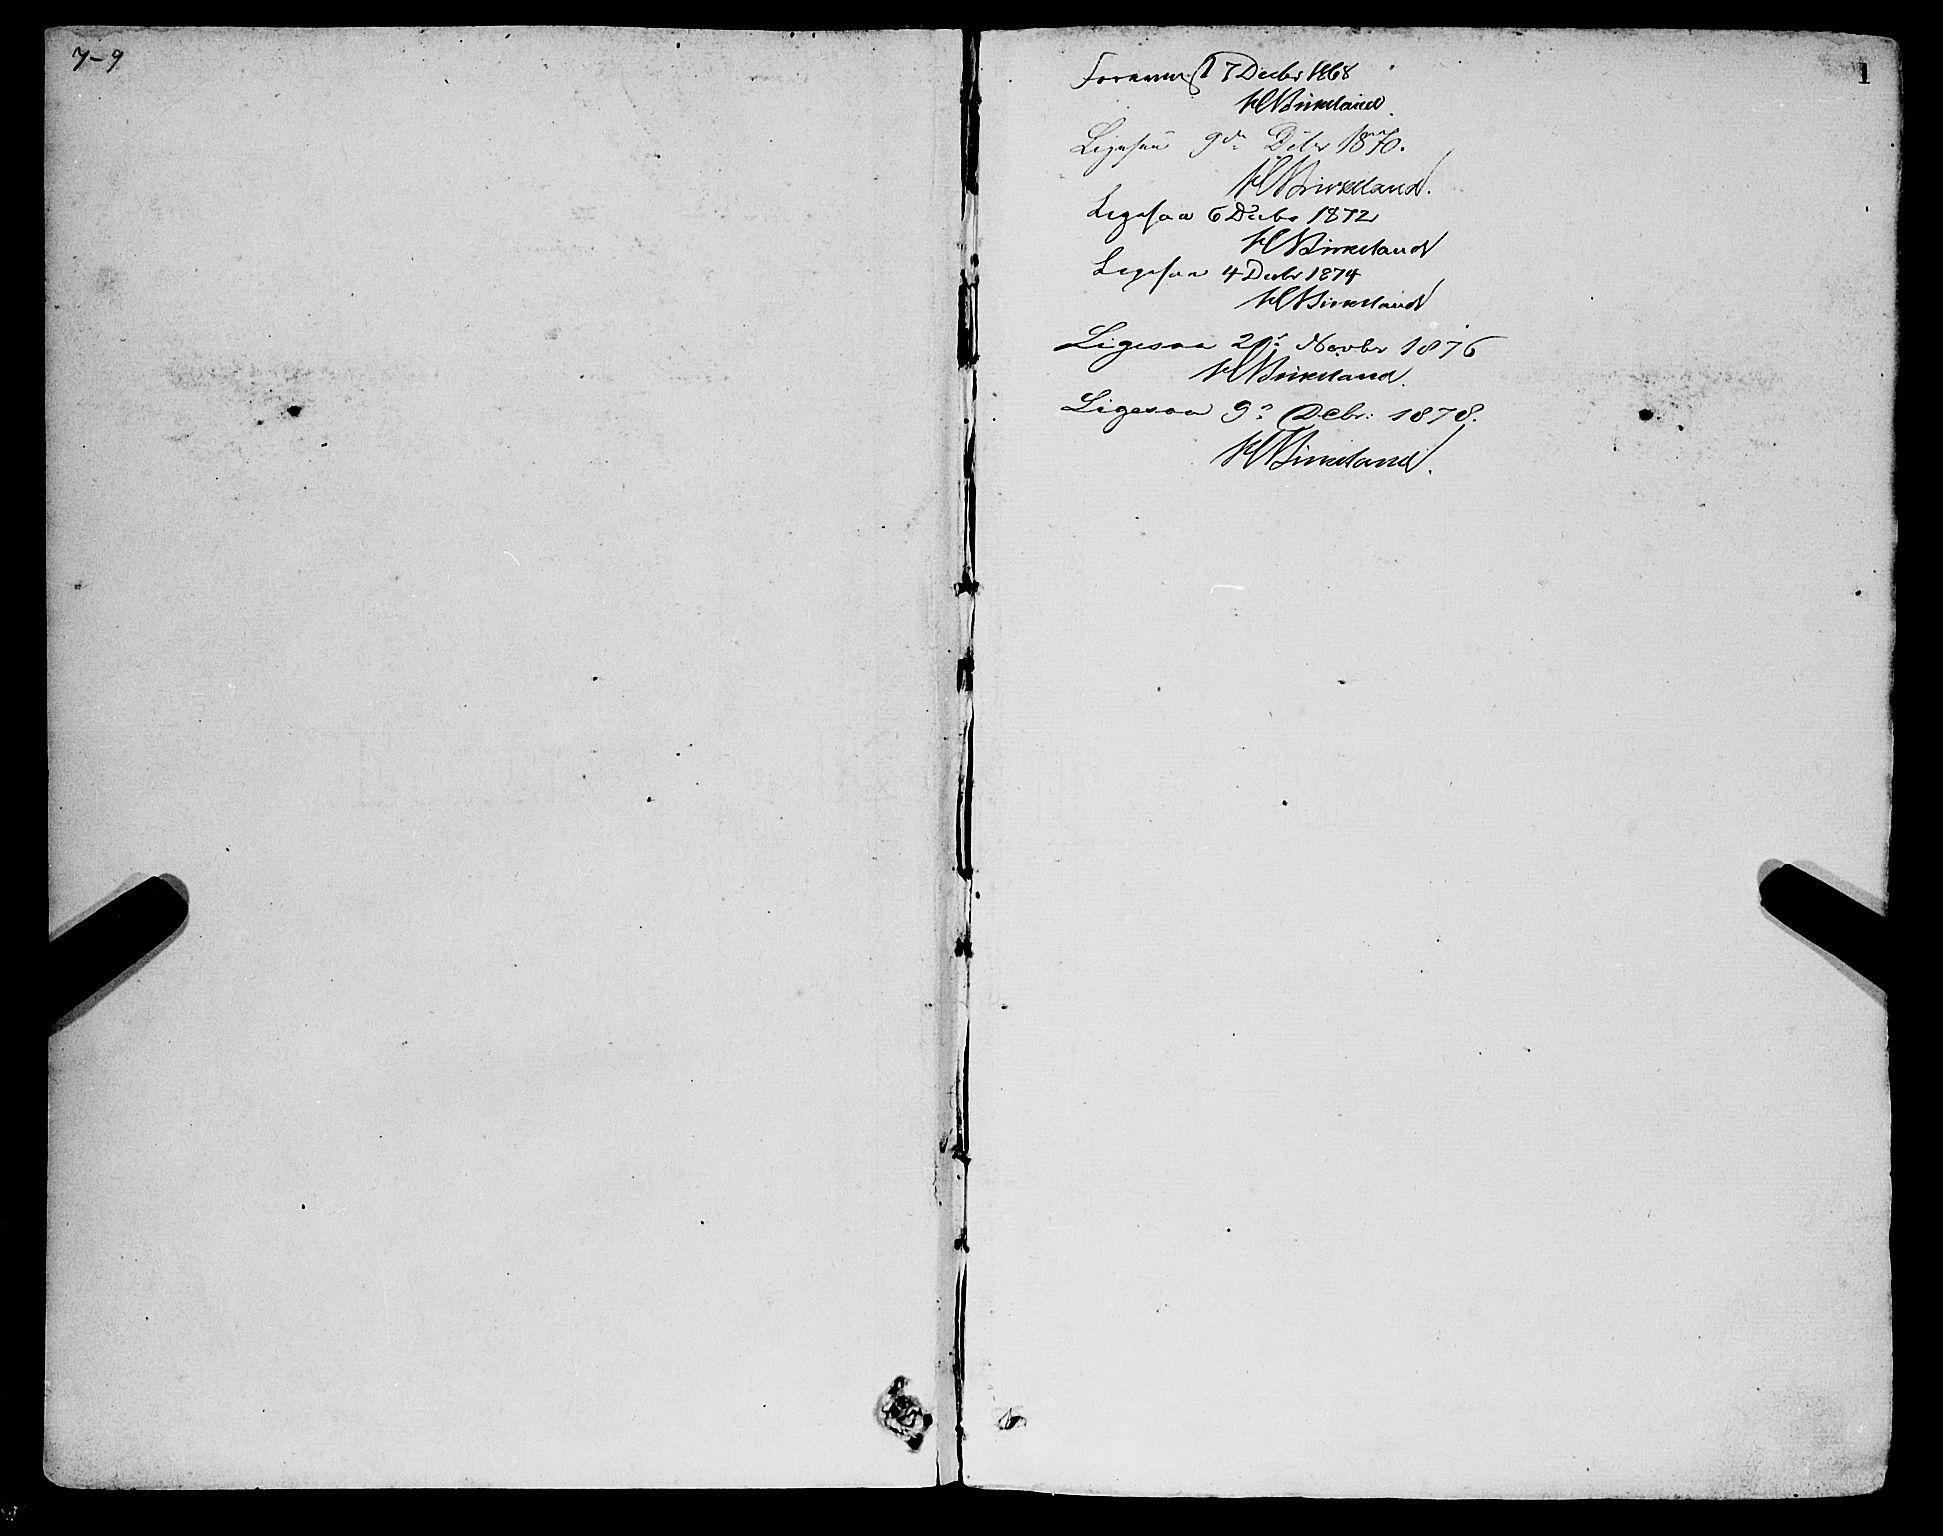 SAB, Sandviken Sokneprestembete, H/Ha/L0001: Ministerialbok nr. A 1, 1867-1877, s. 1